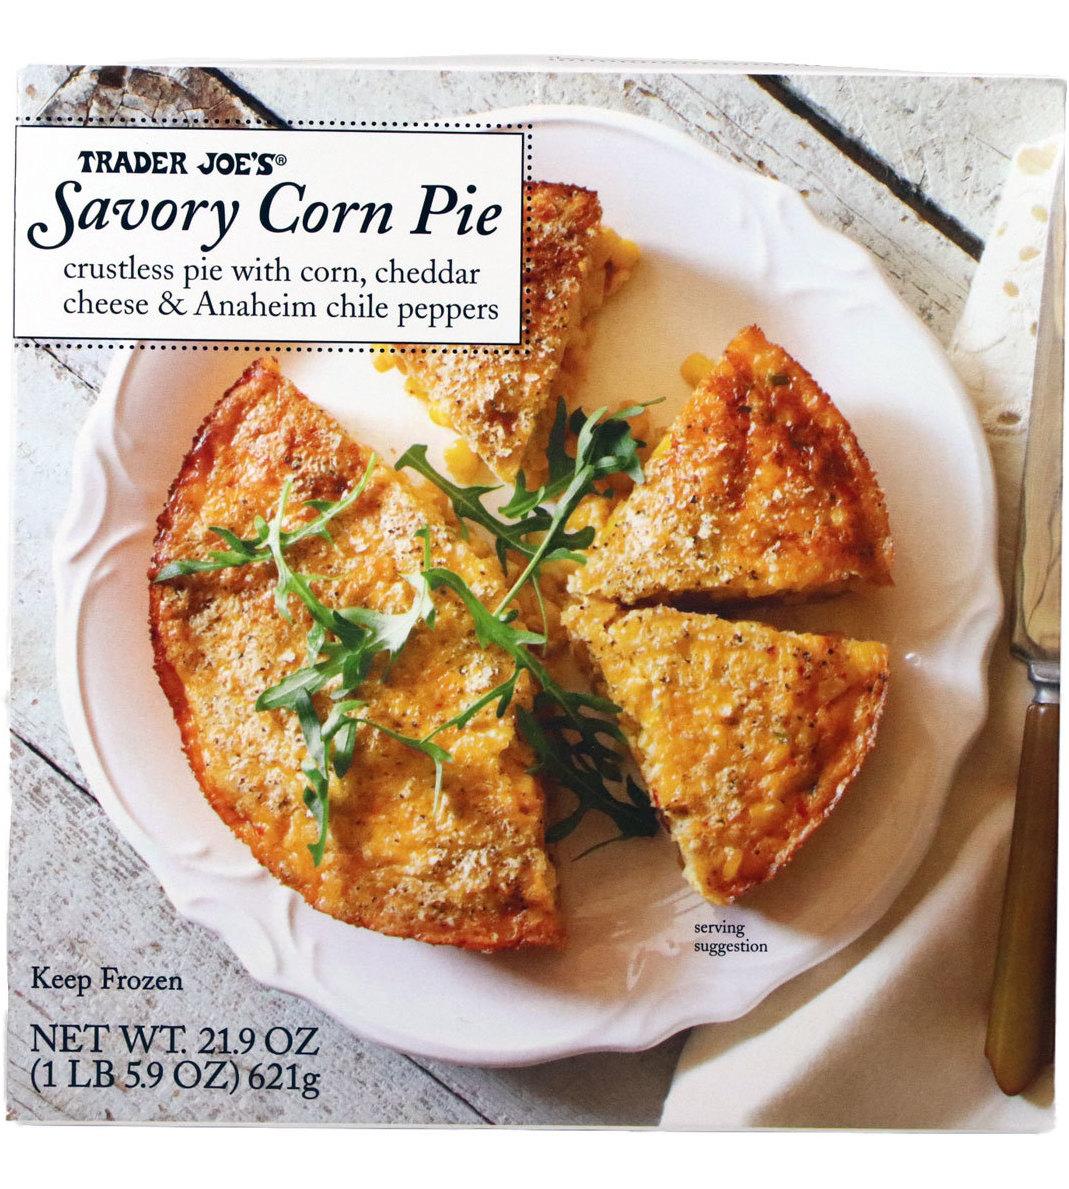 Trader Joe's November picks - Savory Corn Pie